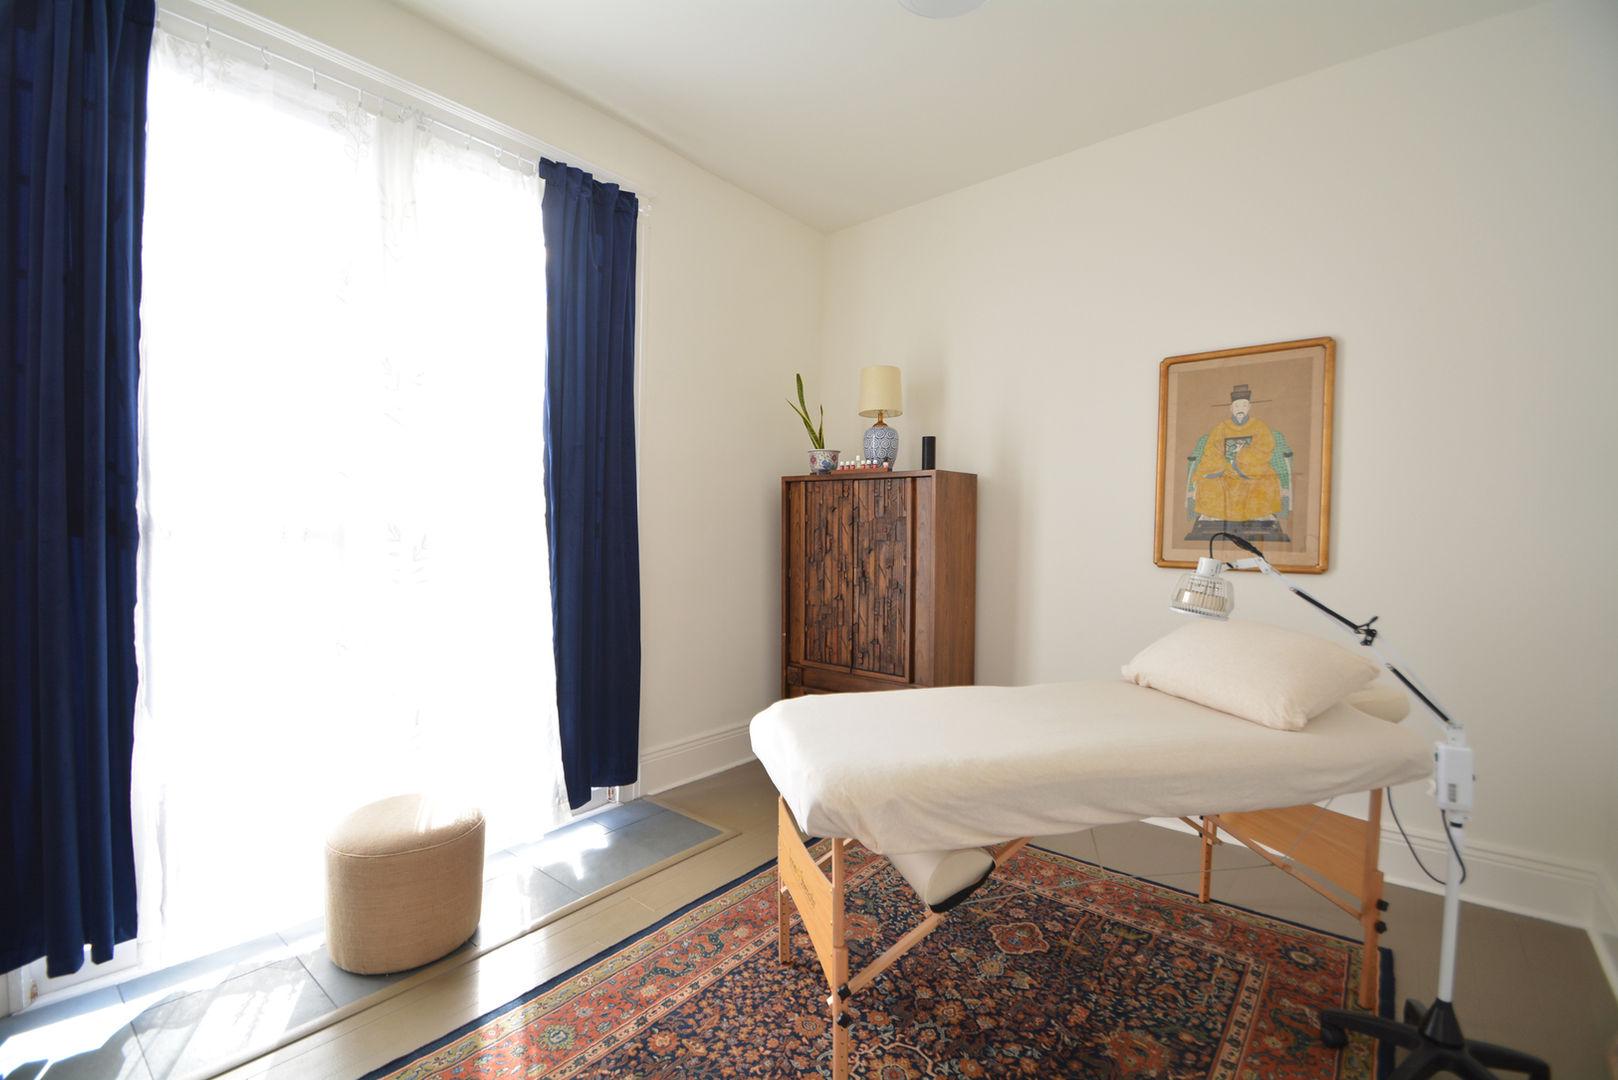 Acupuncture Treatment Room #1